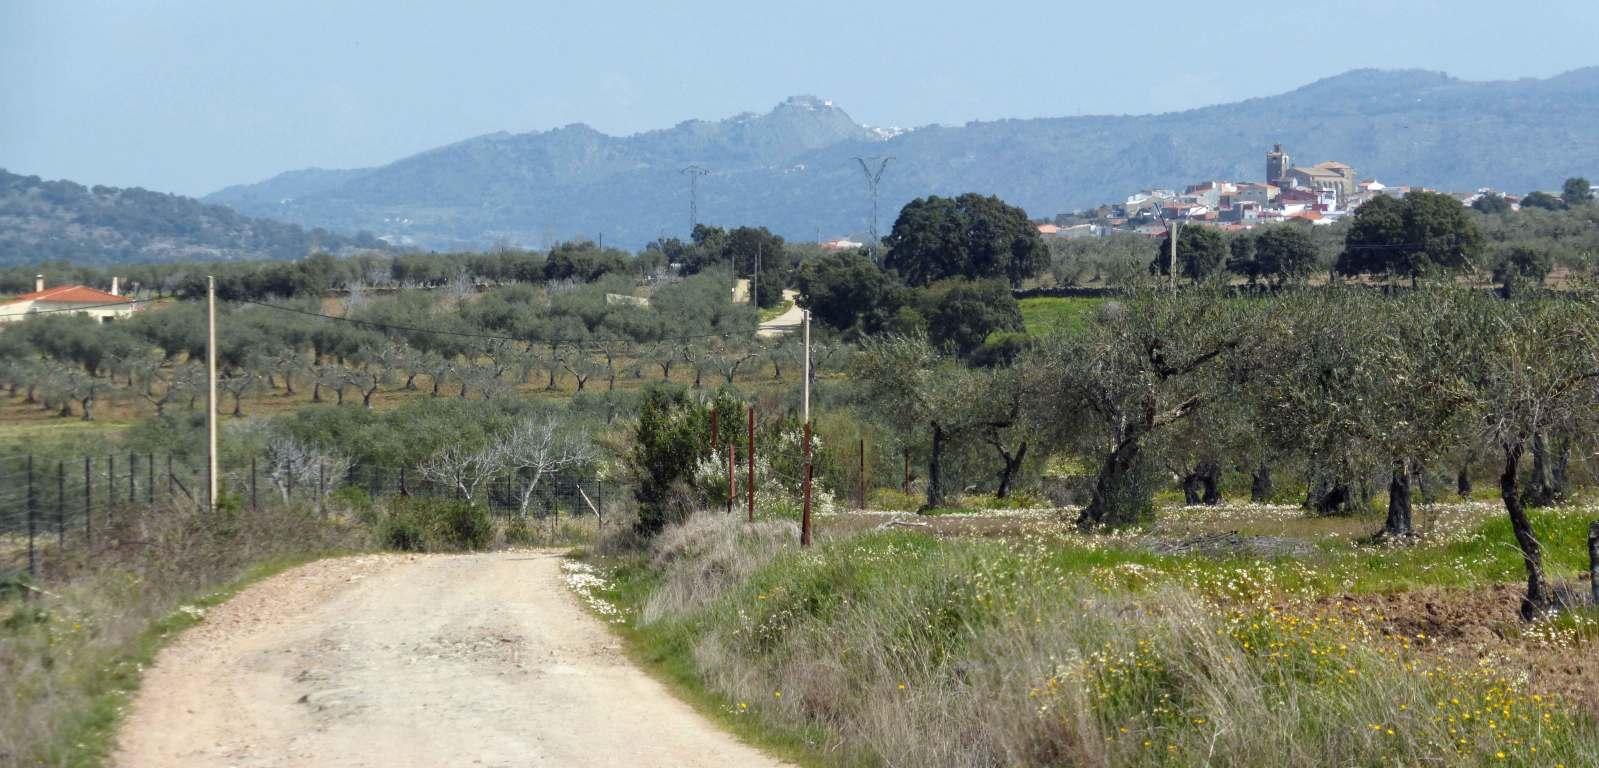 Vía de la Plata-Camino Sanabrés (Sevilla-Santiago). 30c55x3